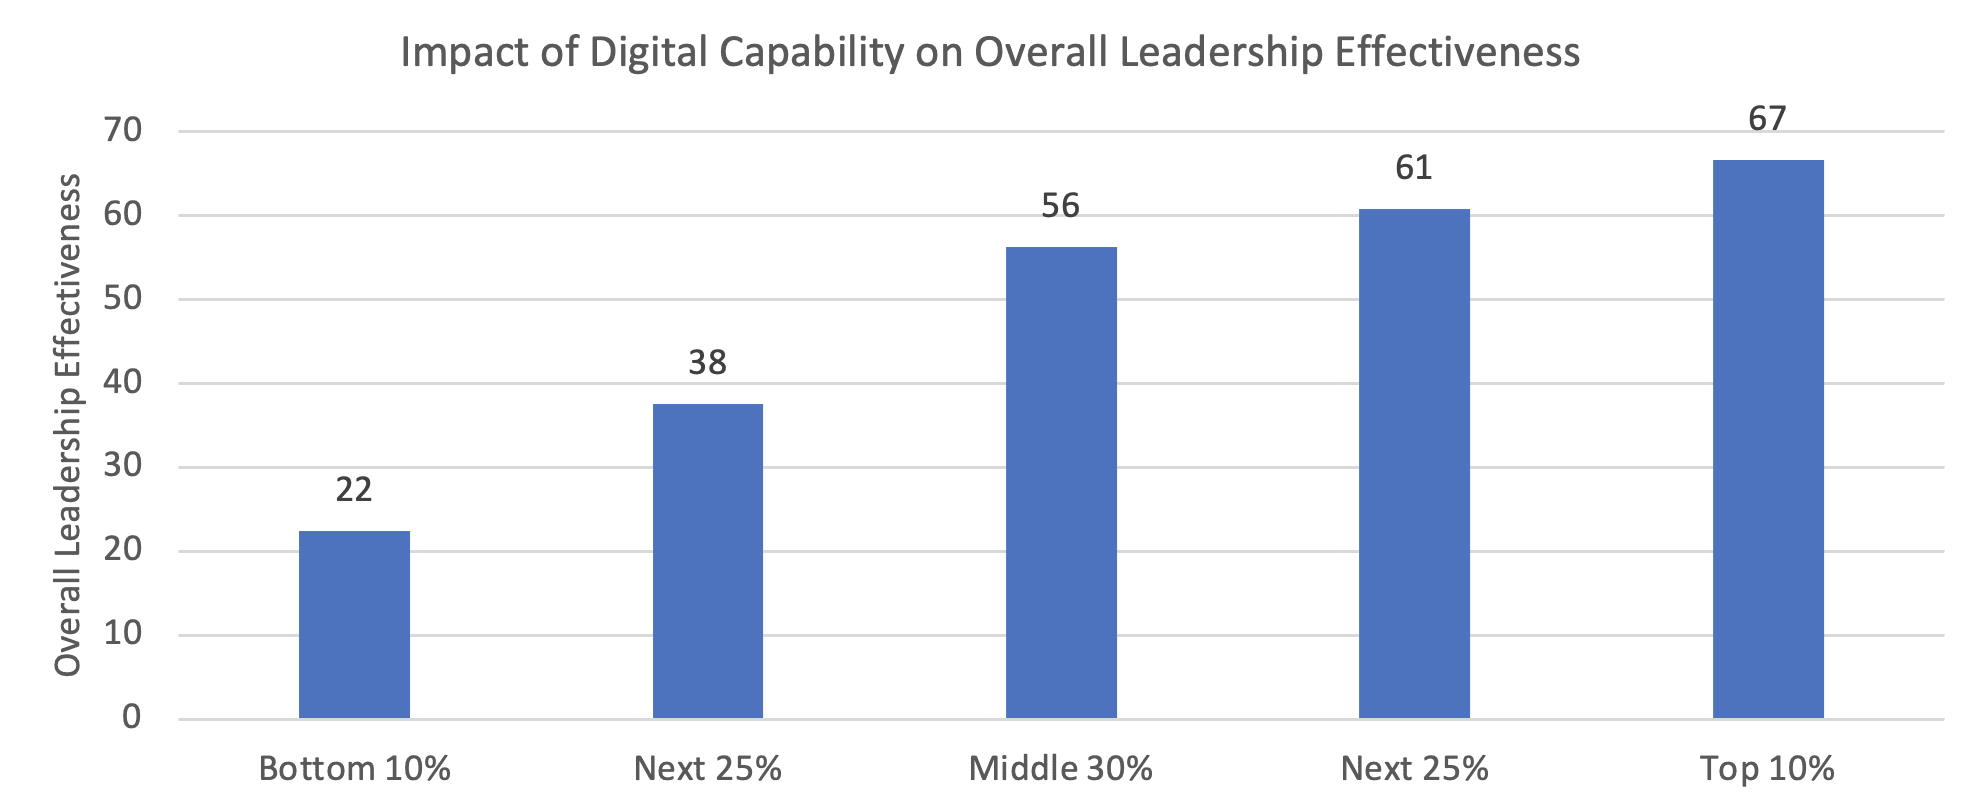 Digital Expertise and Leadership Effectiveness